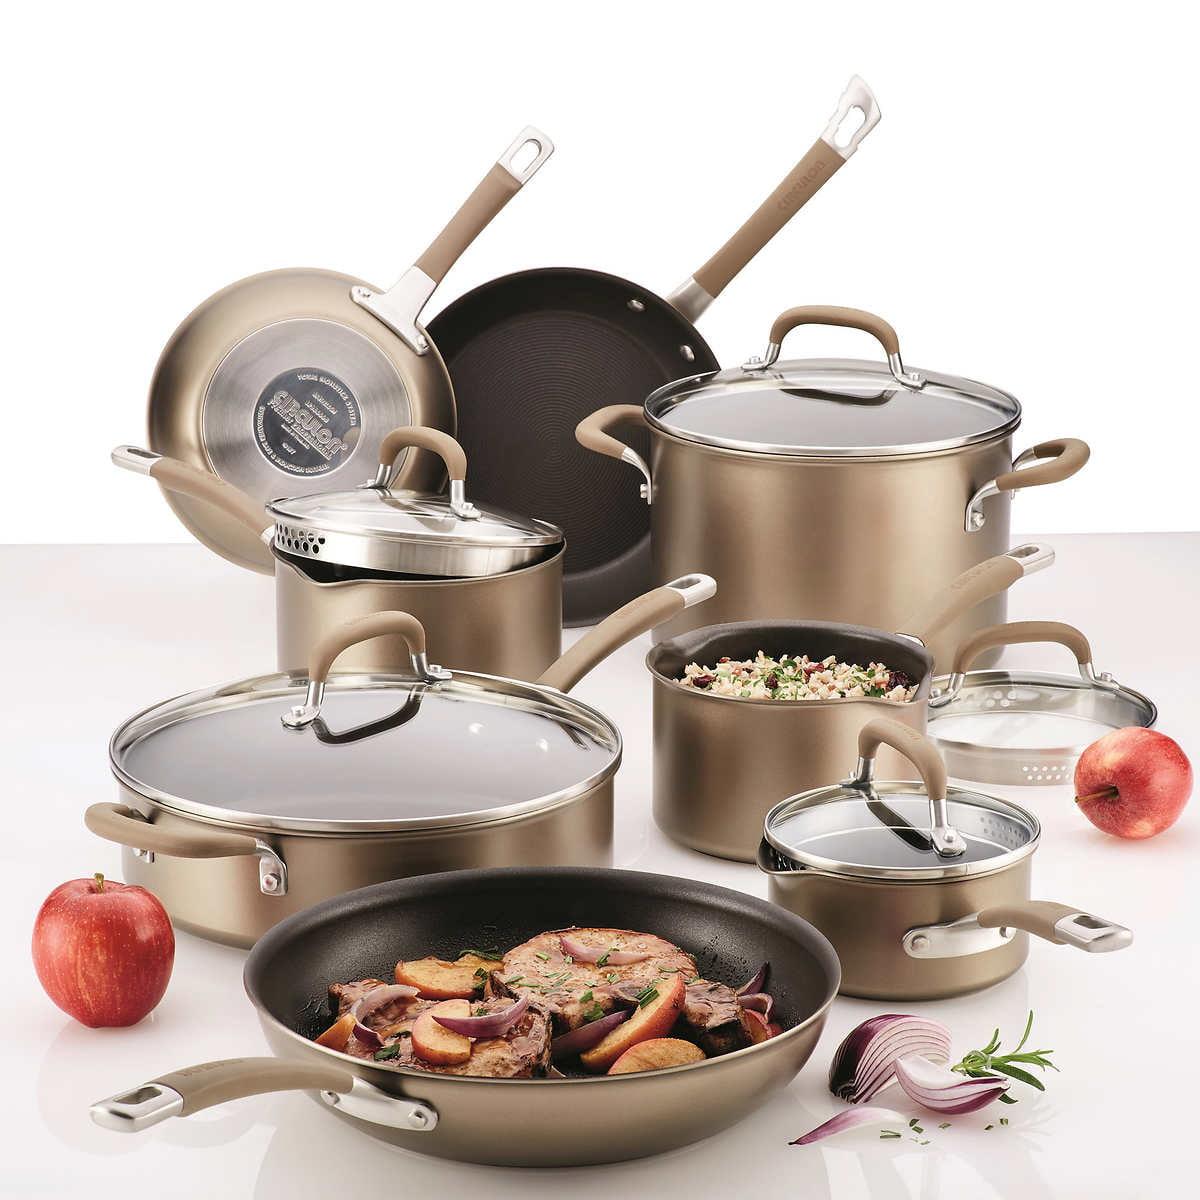 Circulon Premier Professional Nonstick 13-piece Cookware Set by